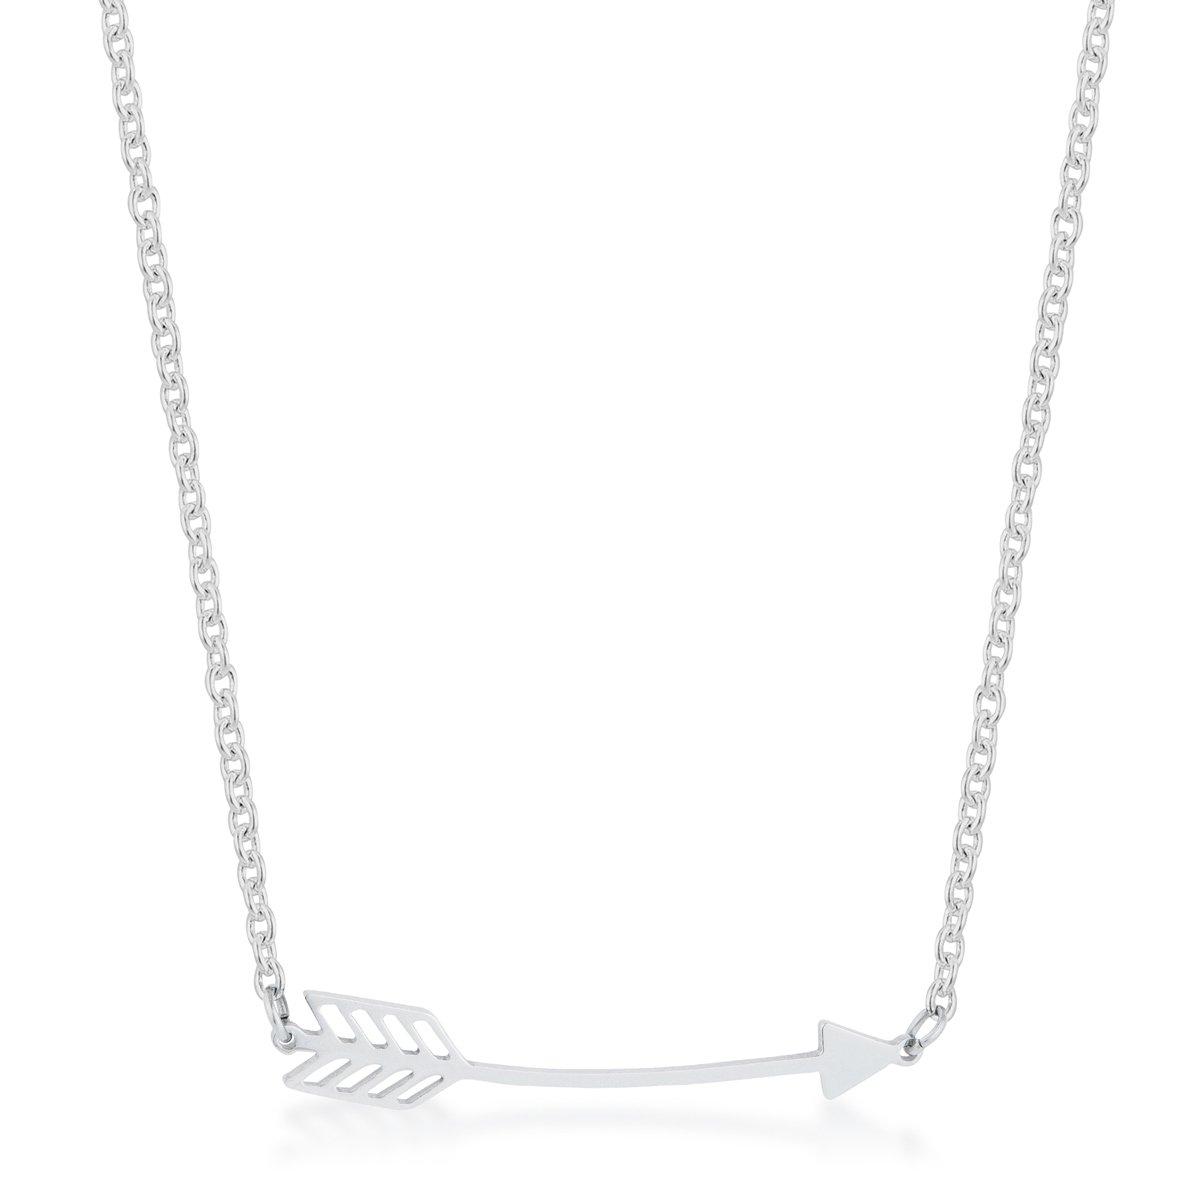 Arianna Rhodium Stainless Steel Arrow Necklace By Kate Bissett